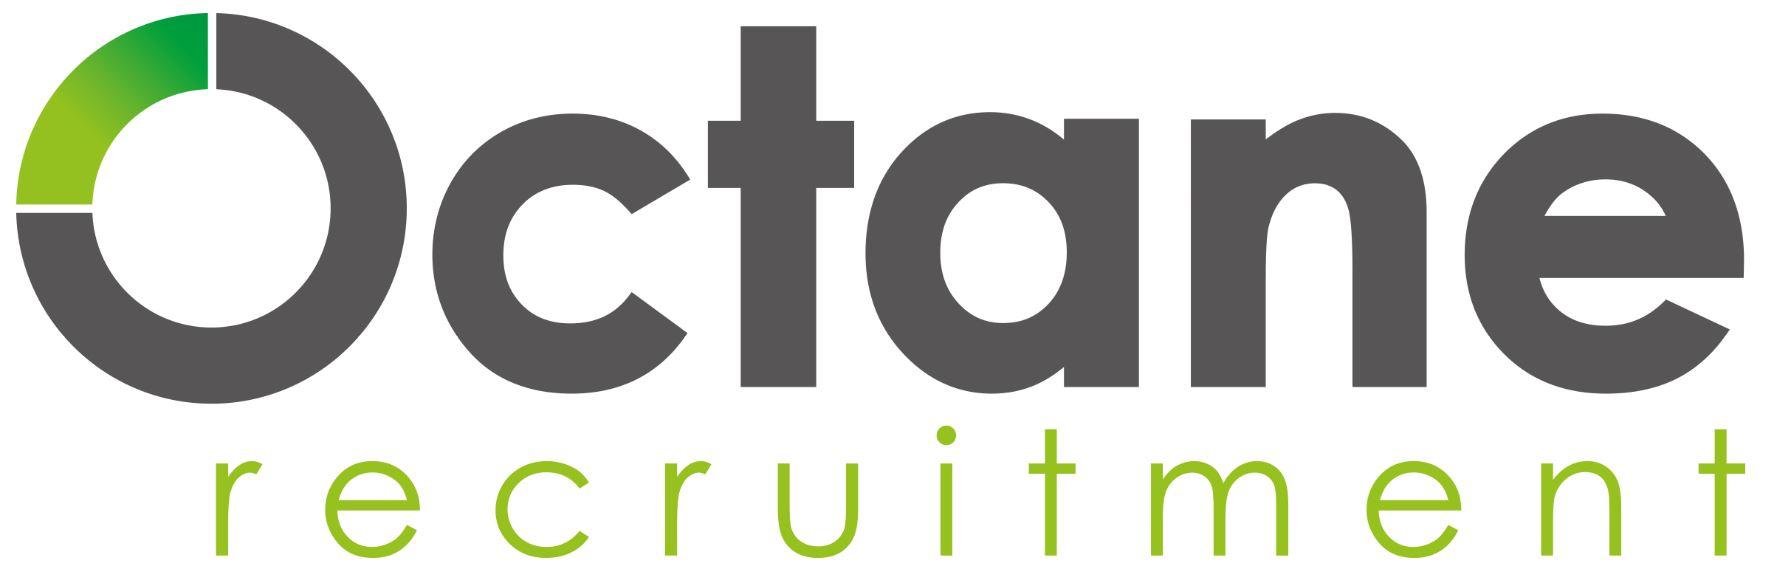 Octane Recruitment